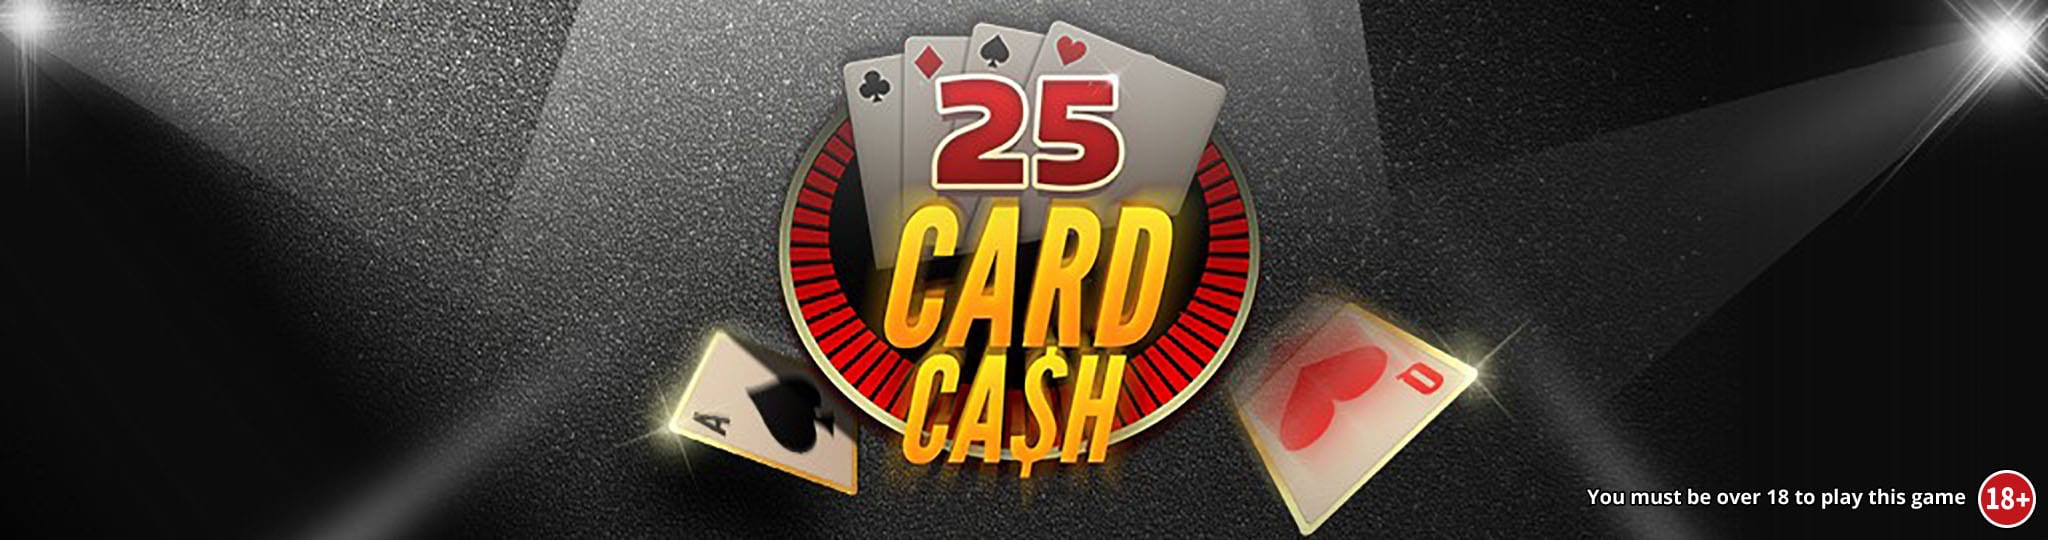 25 Card Cash Wizard Slots